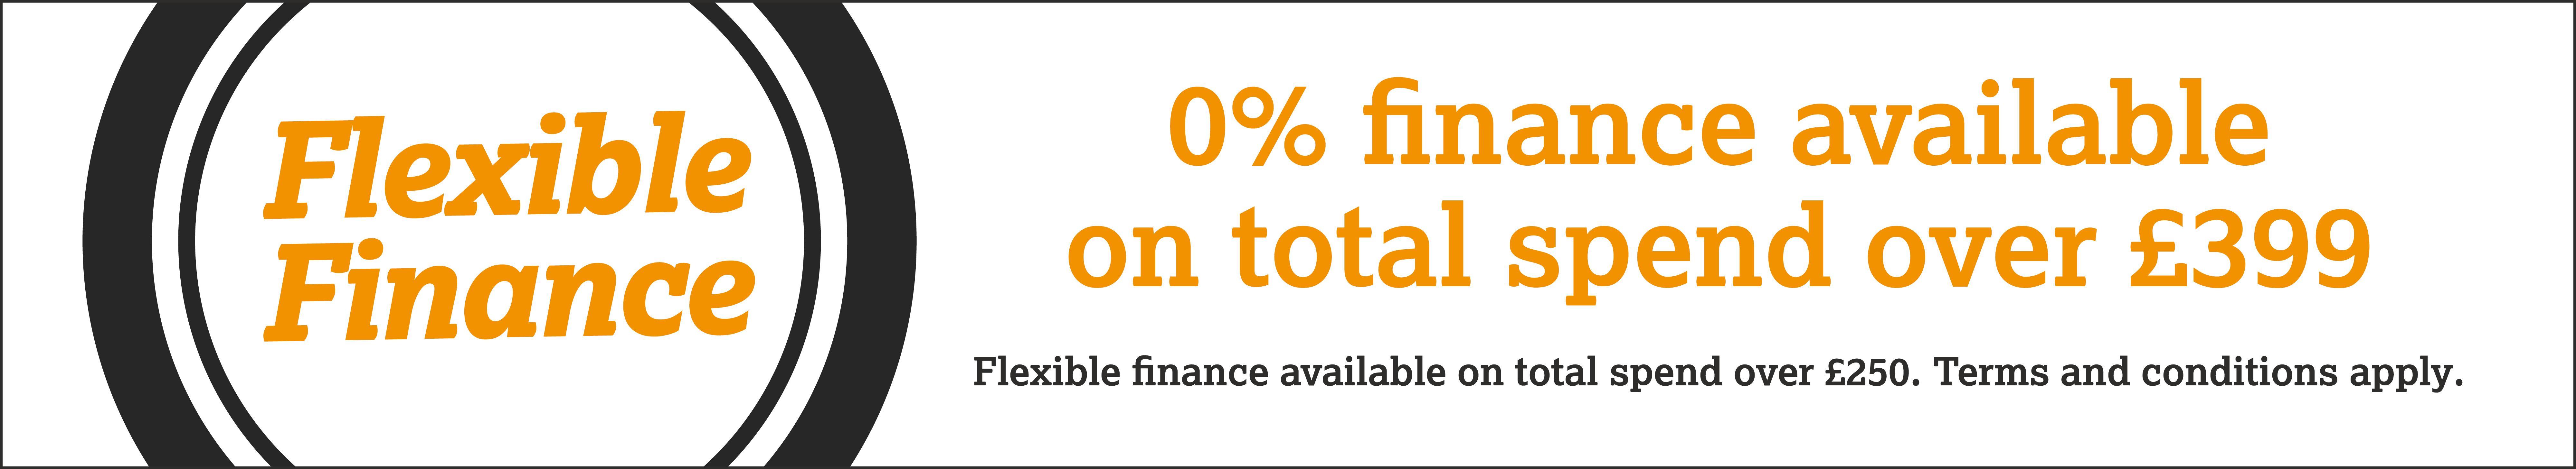 Flexible Finance Banner